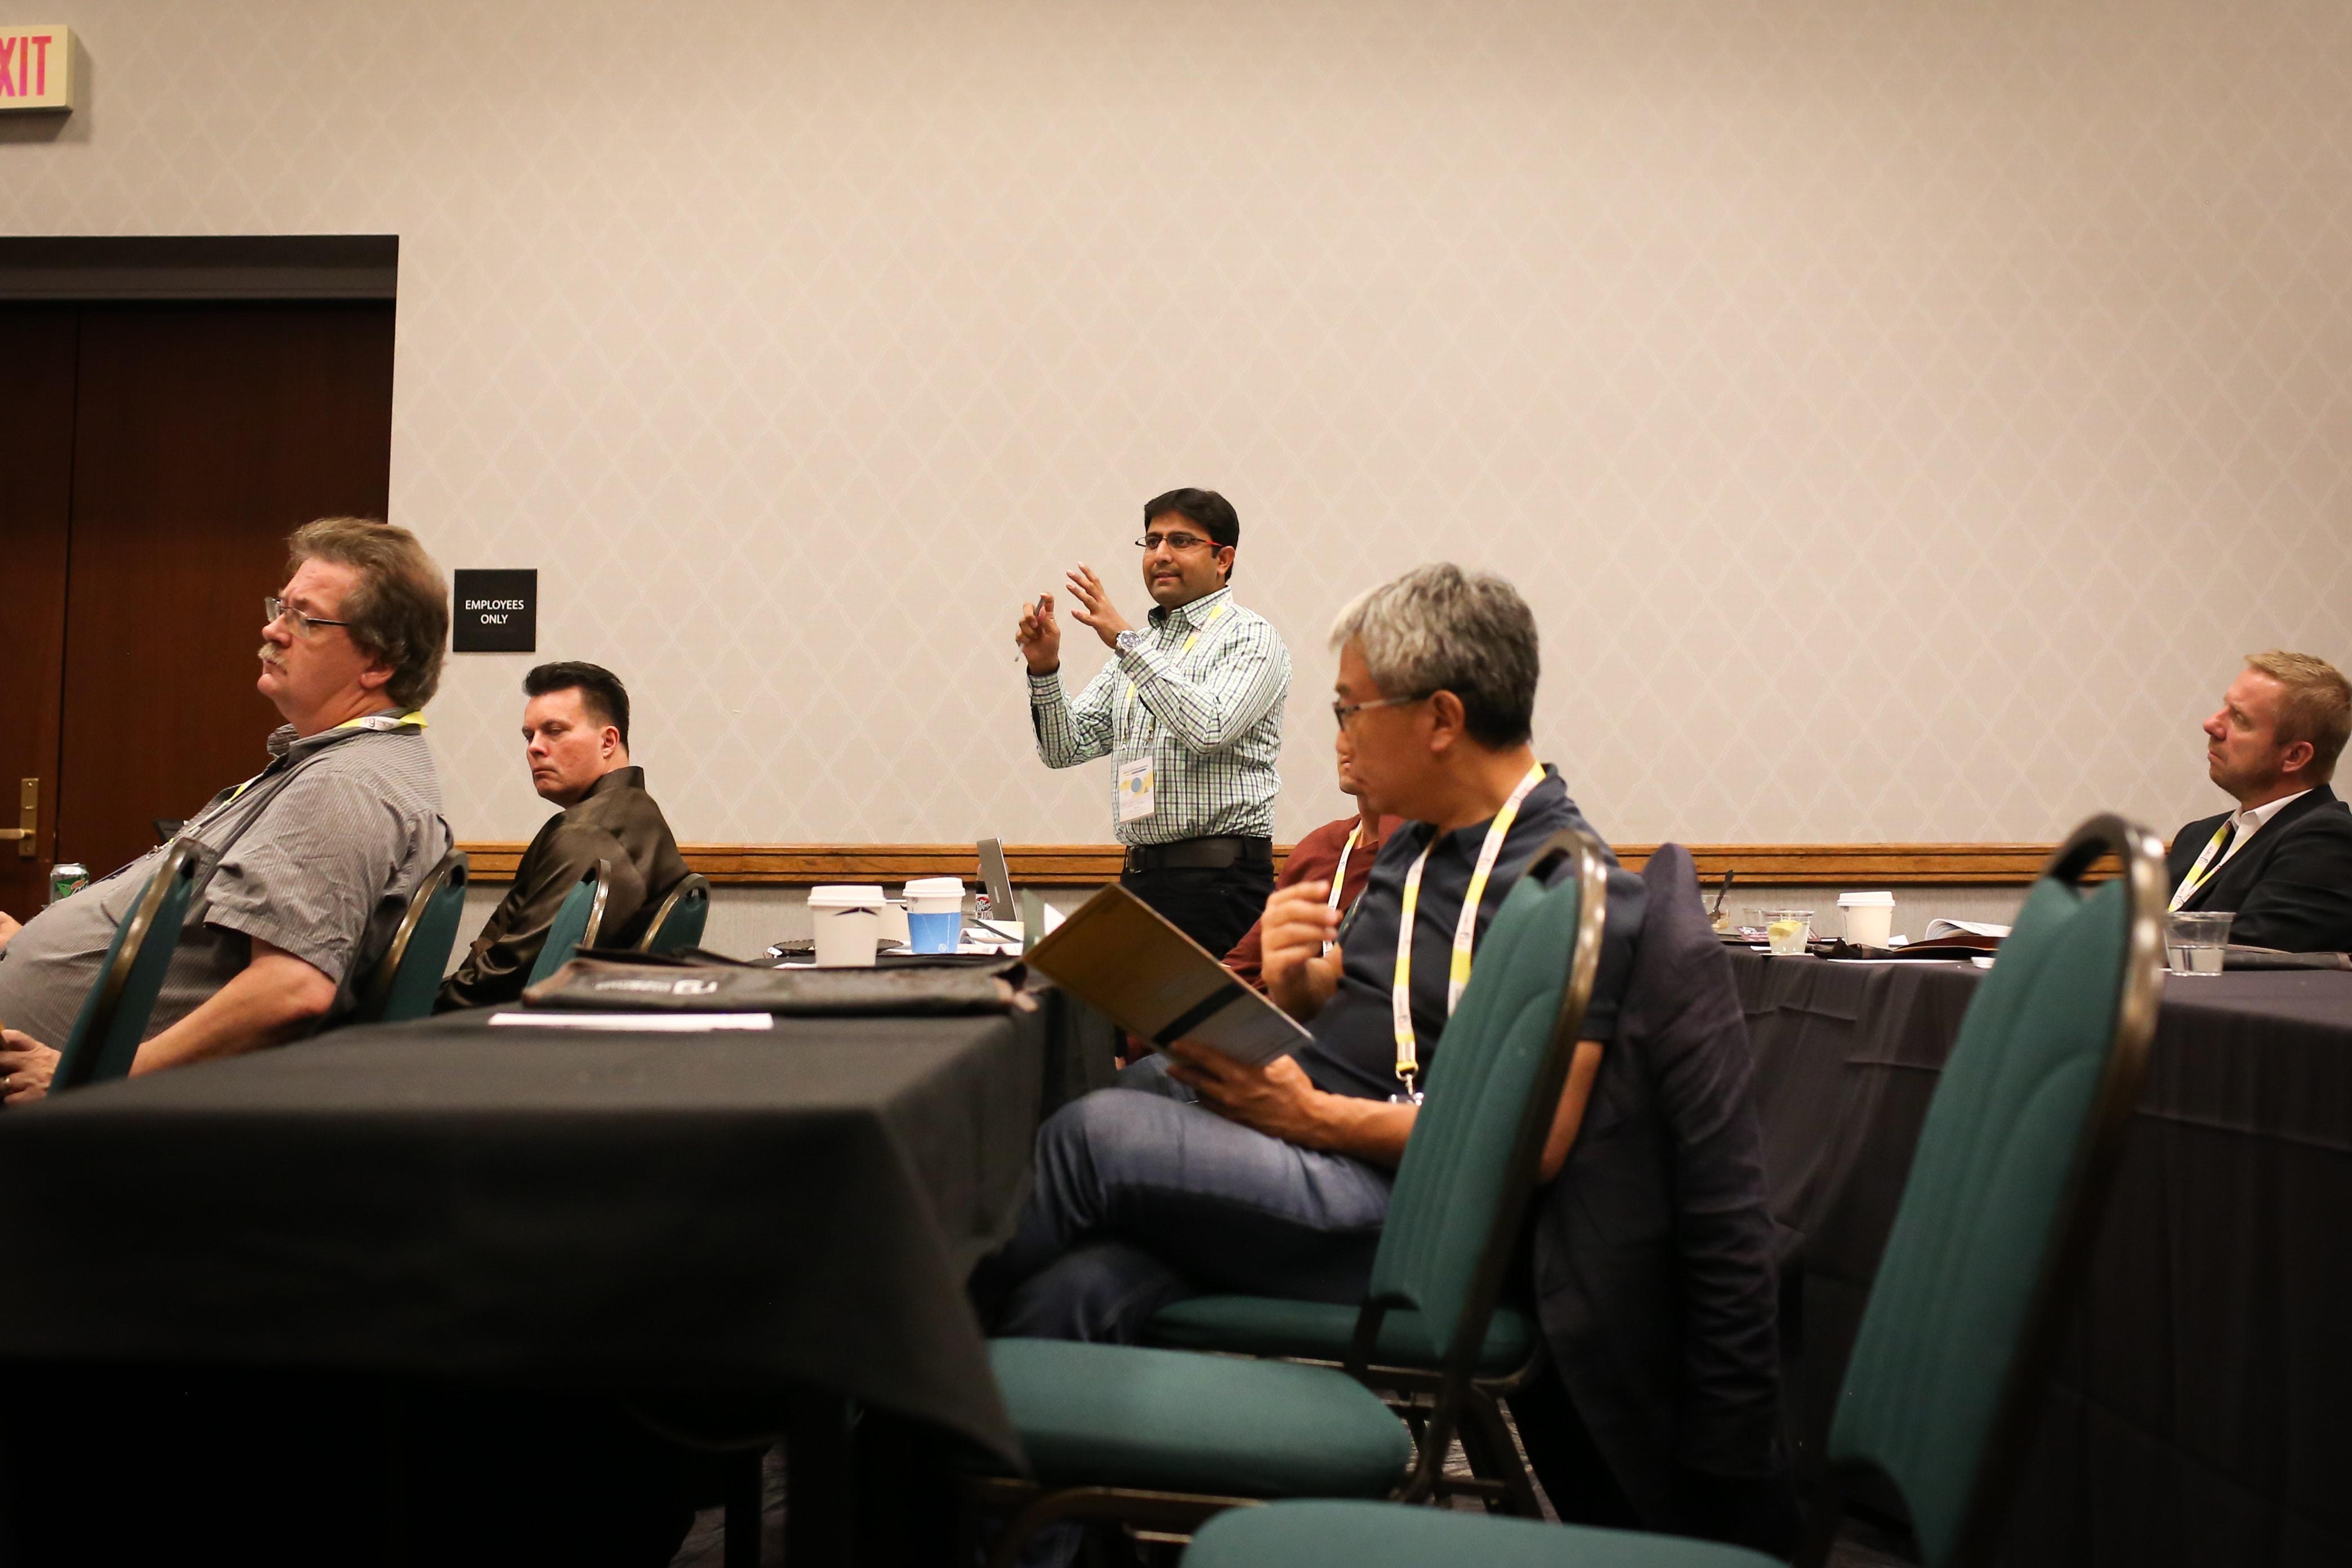 GCR 2017 speaker query session